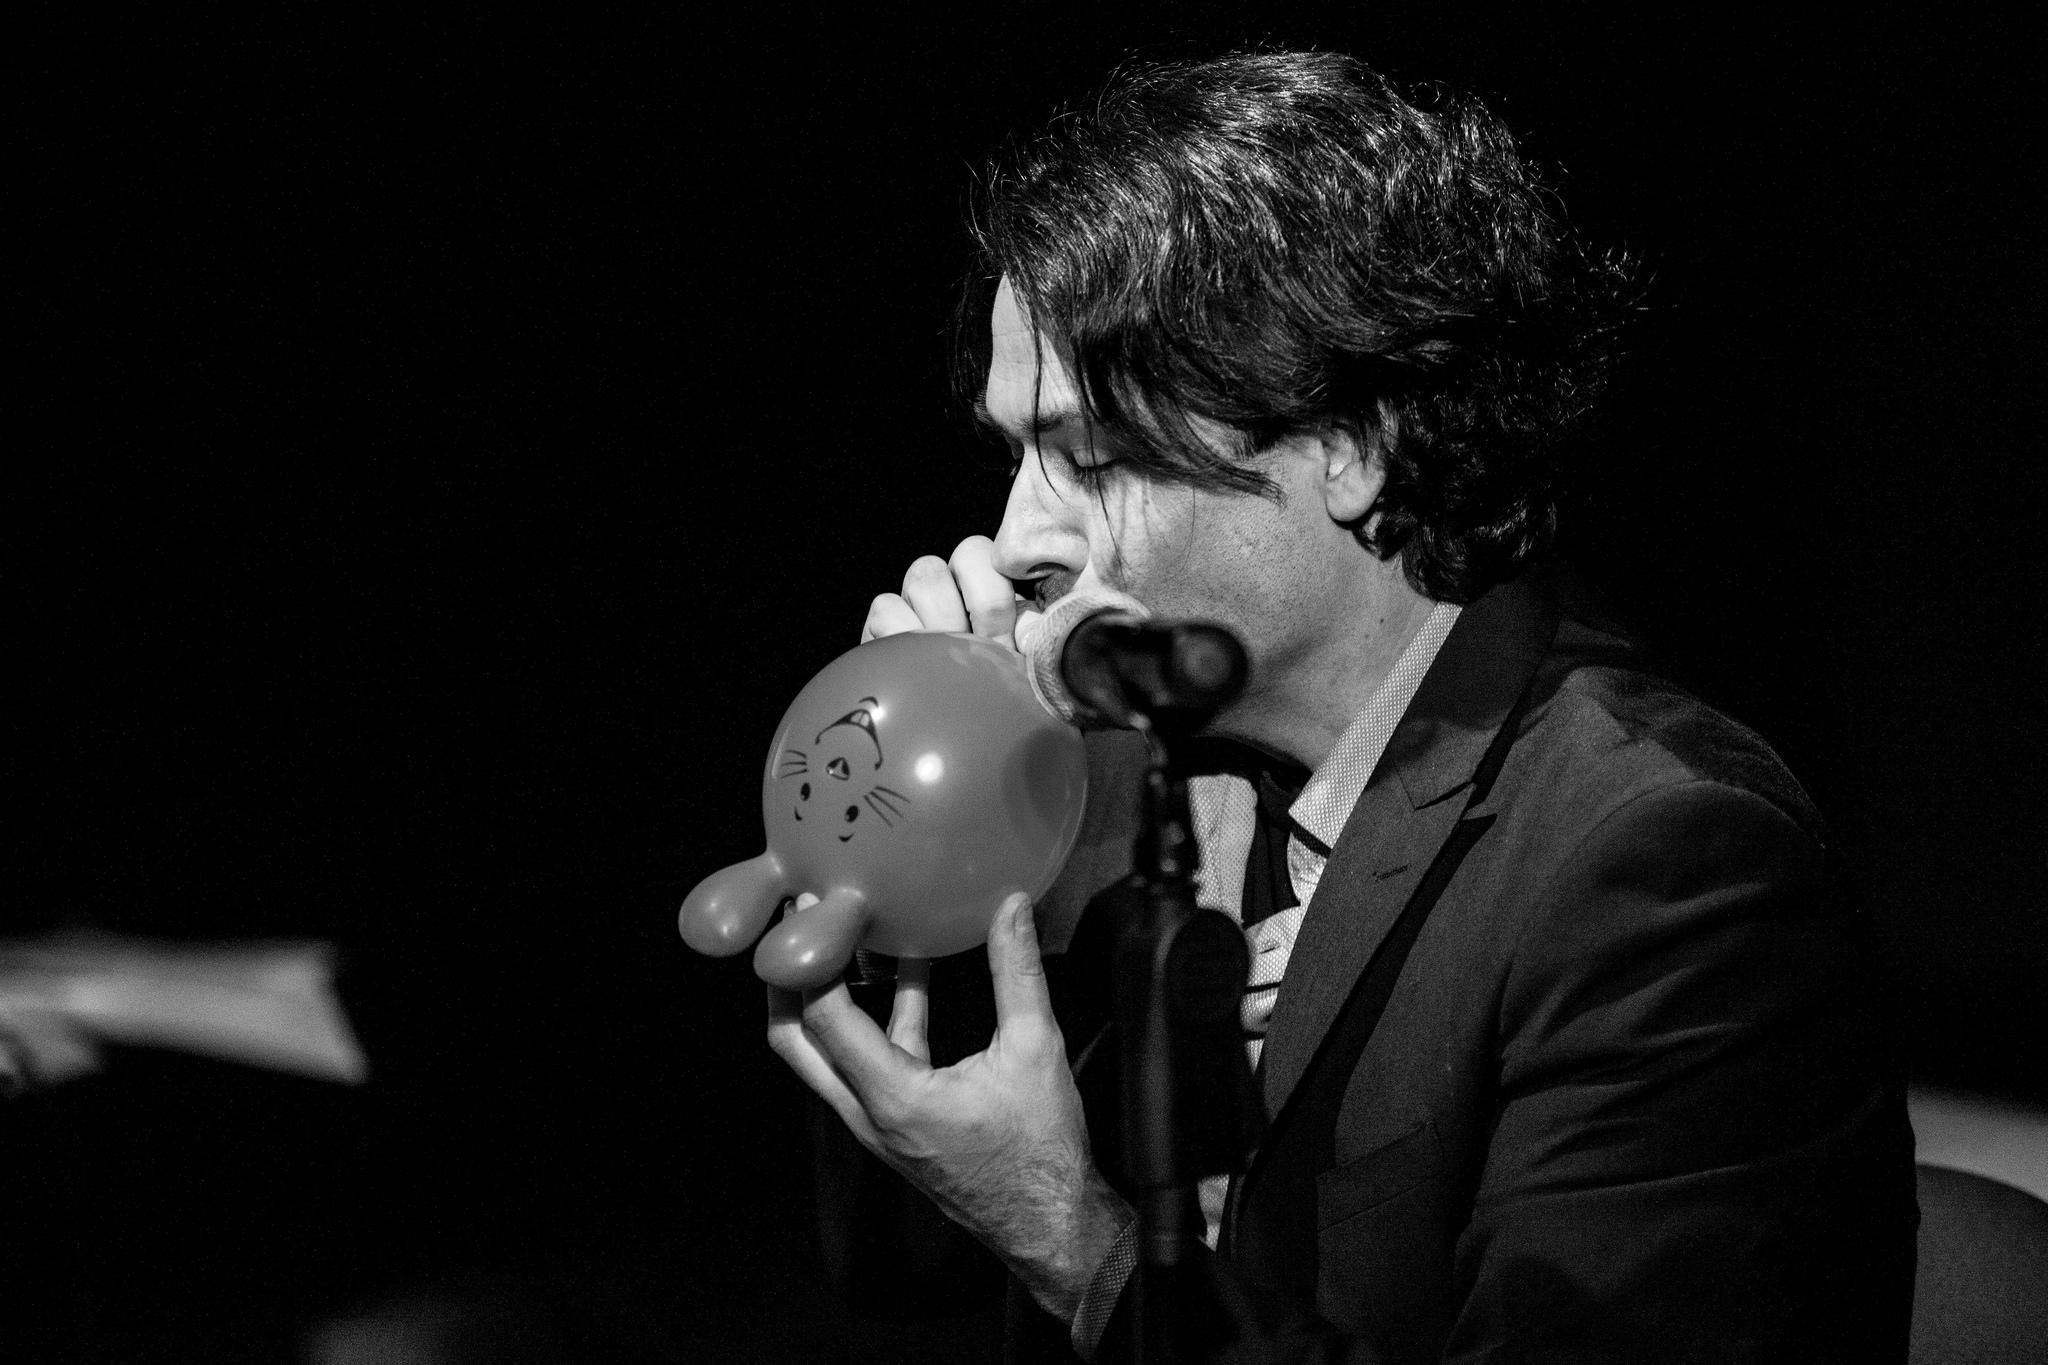 Jordan Morris performing at Words on Wire shot by Adam Thomas.